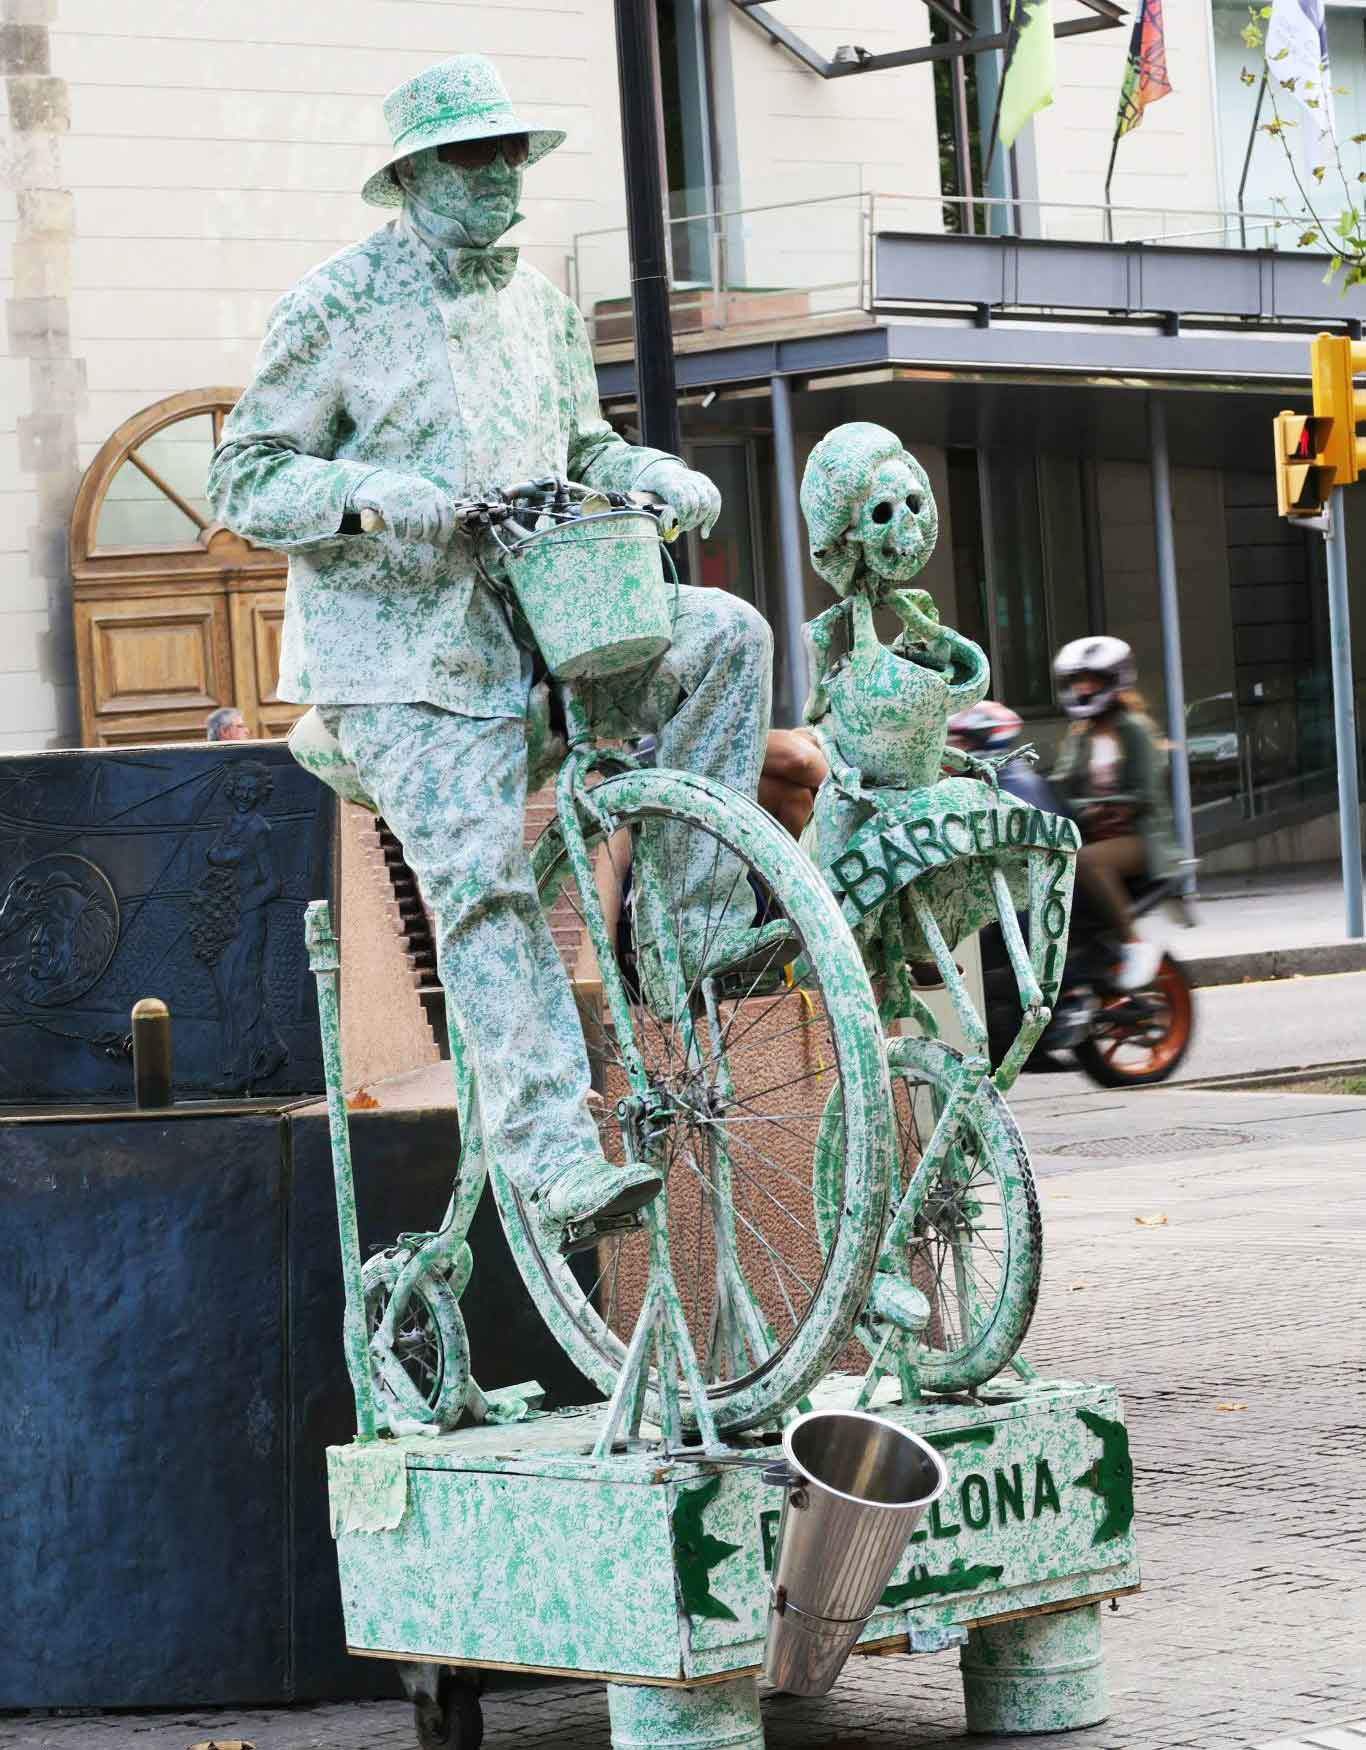 skeleton statue riding a bike in Las Ramblas, Barcelona, Spain